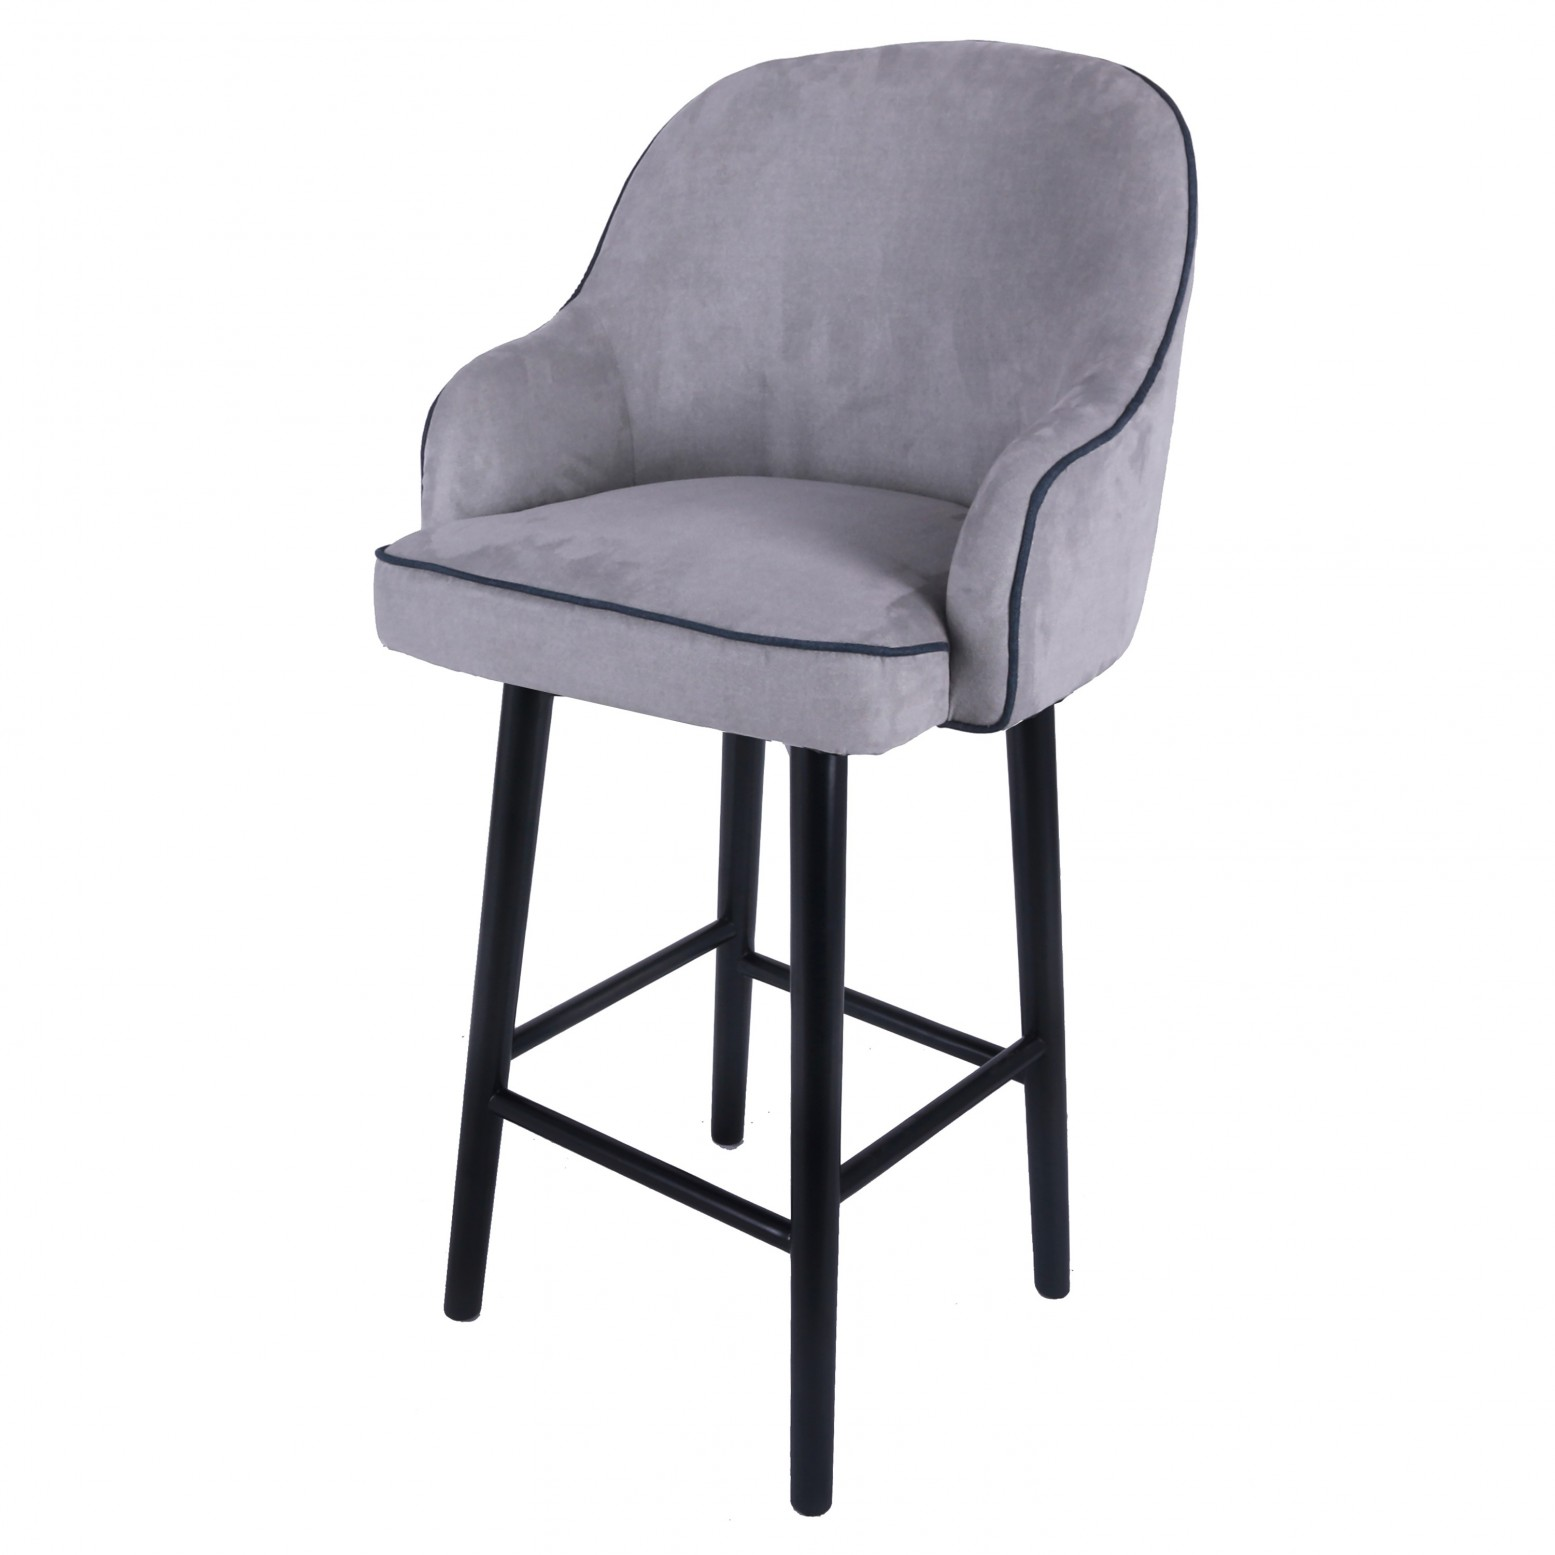 Marvelous Terry Fabric Swivel Bar Stool Black Legs Denim Dove Gray Uwap Interior Chair Design Uwaporg